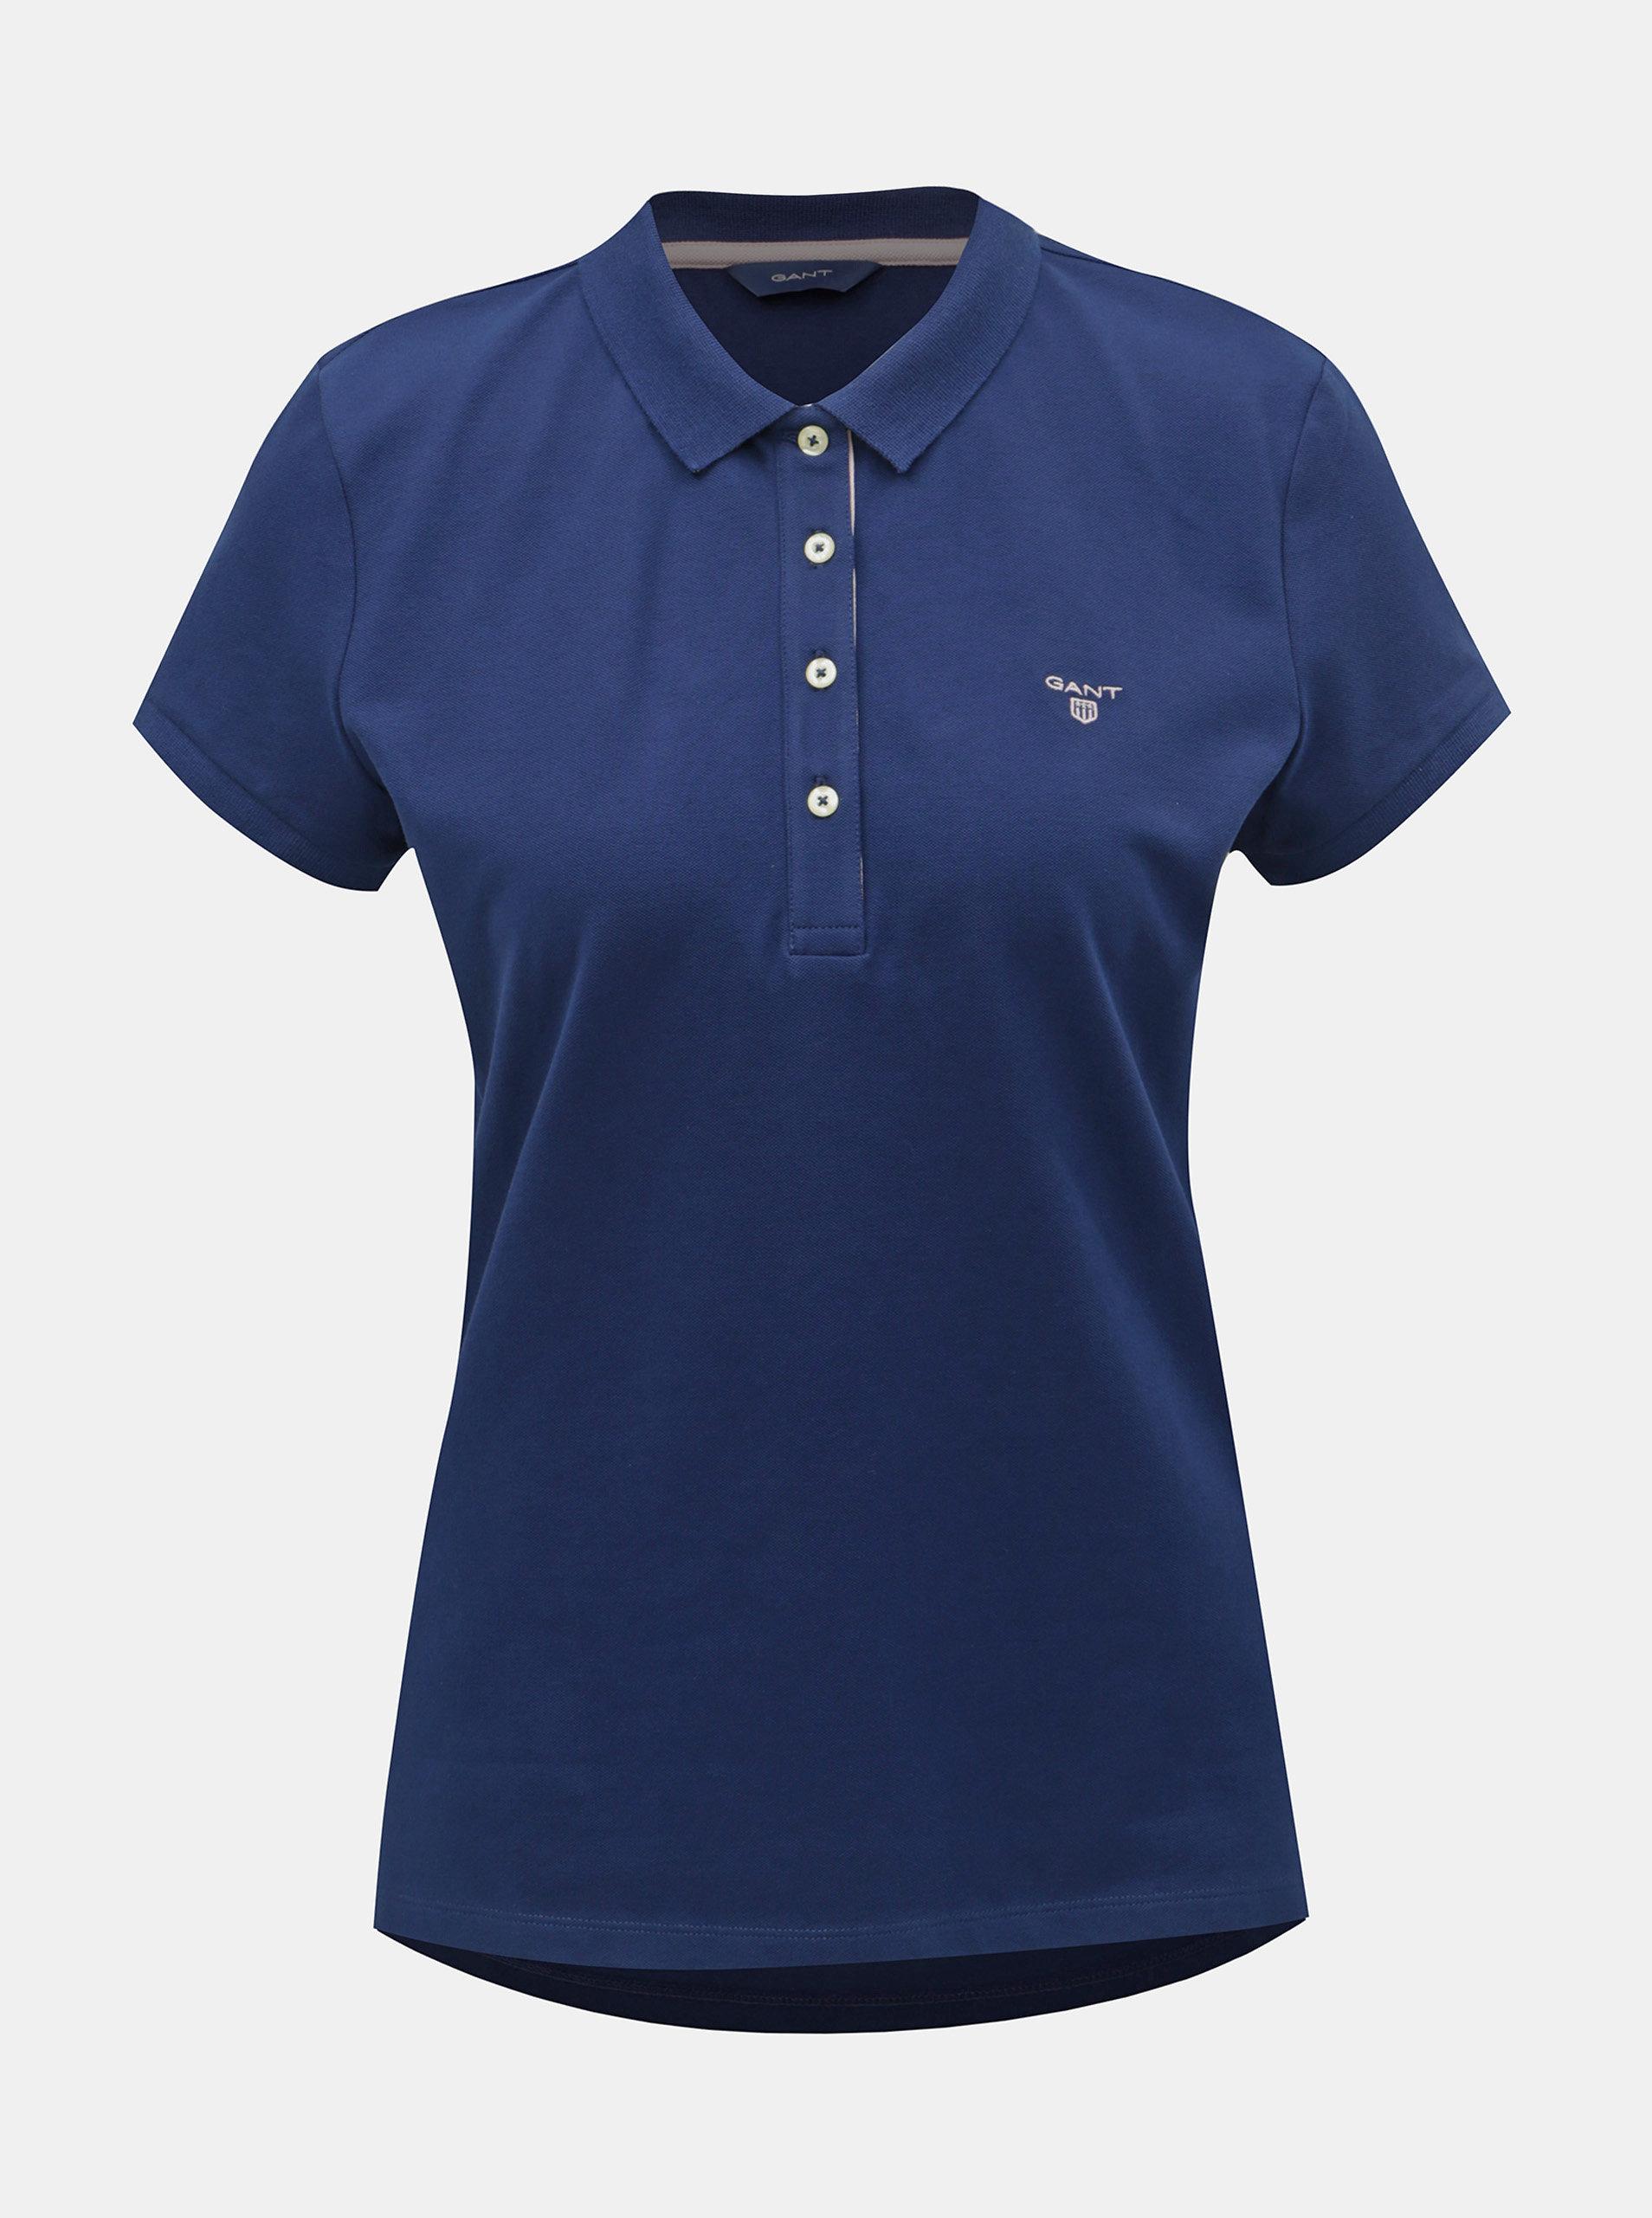 070ee43722d9 Tmavě modré dámské polo tričko GANT ...